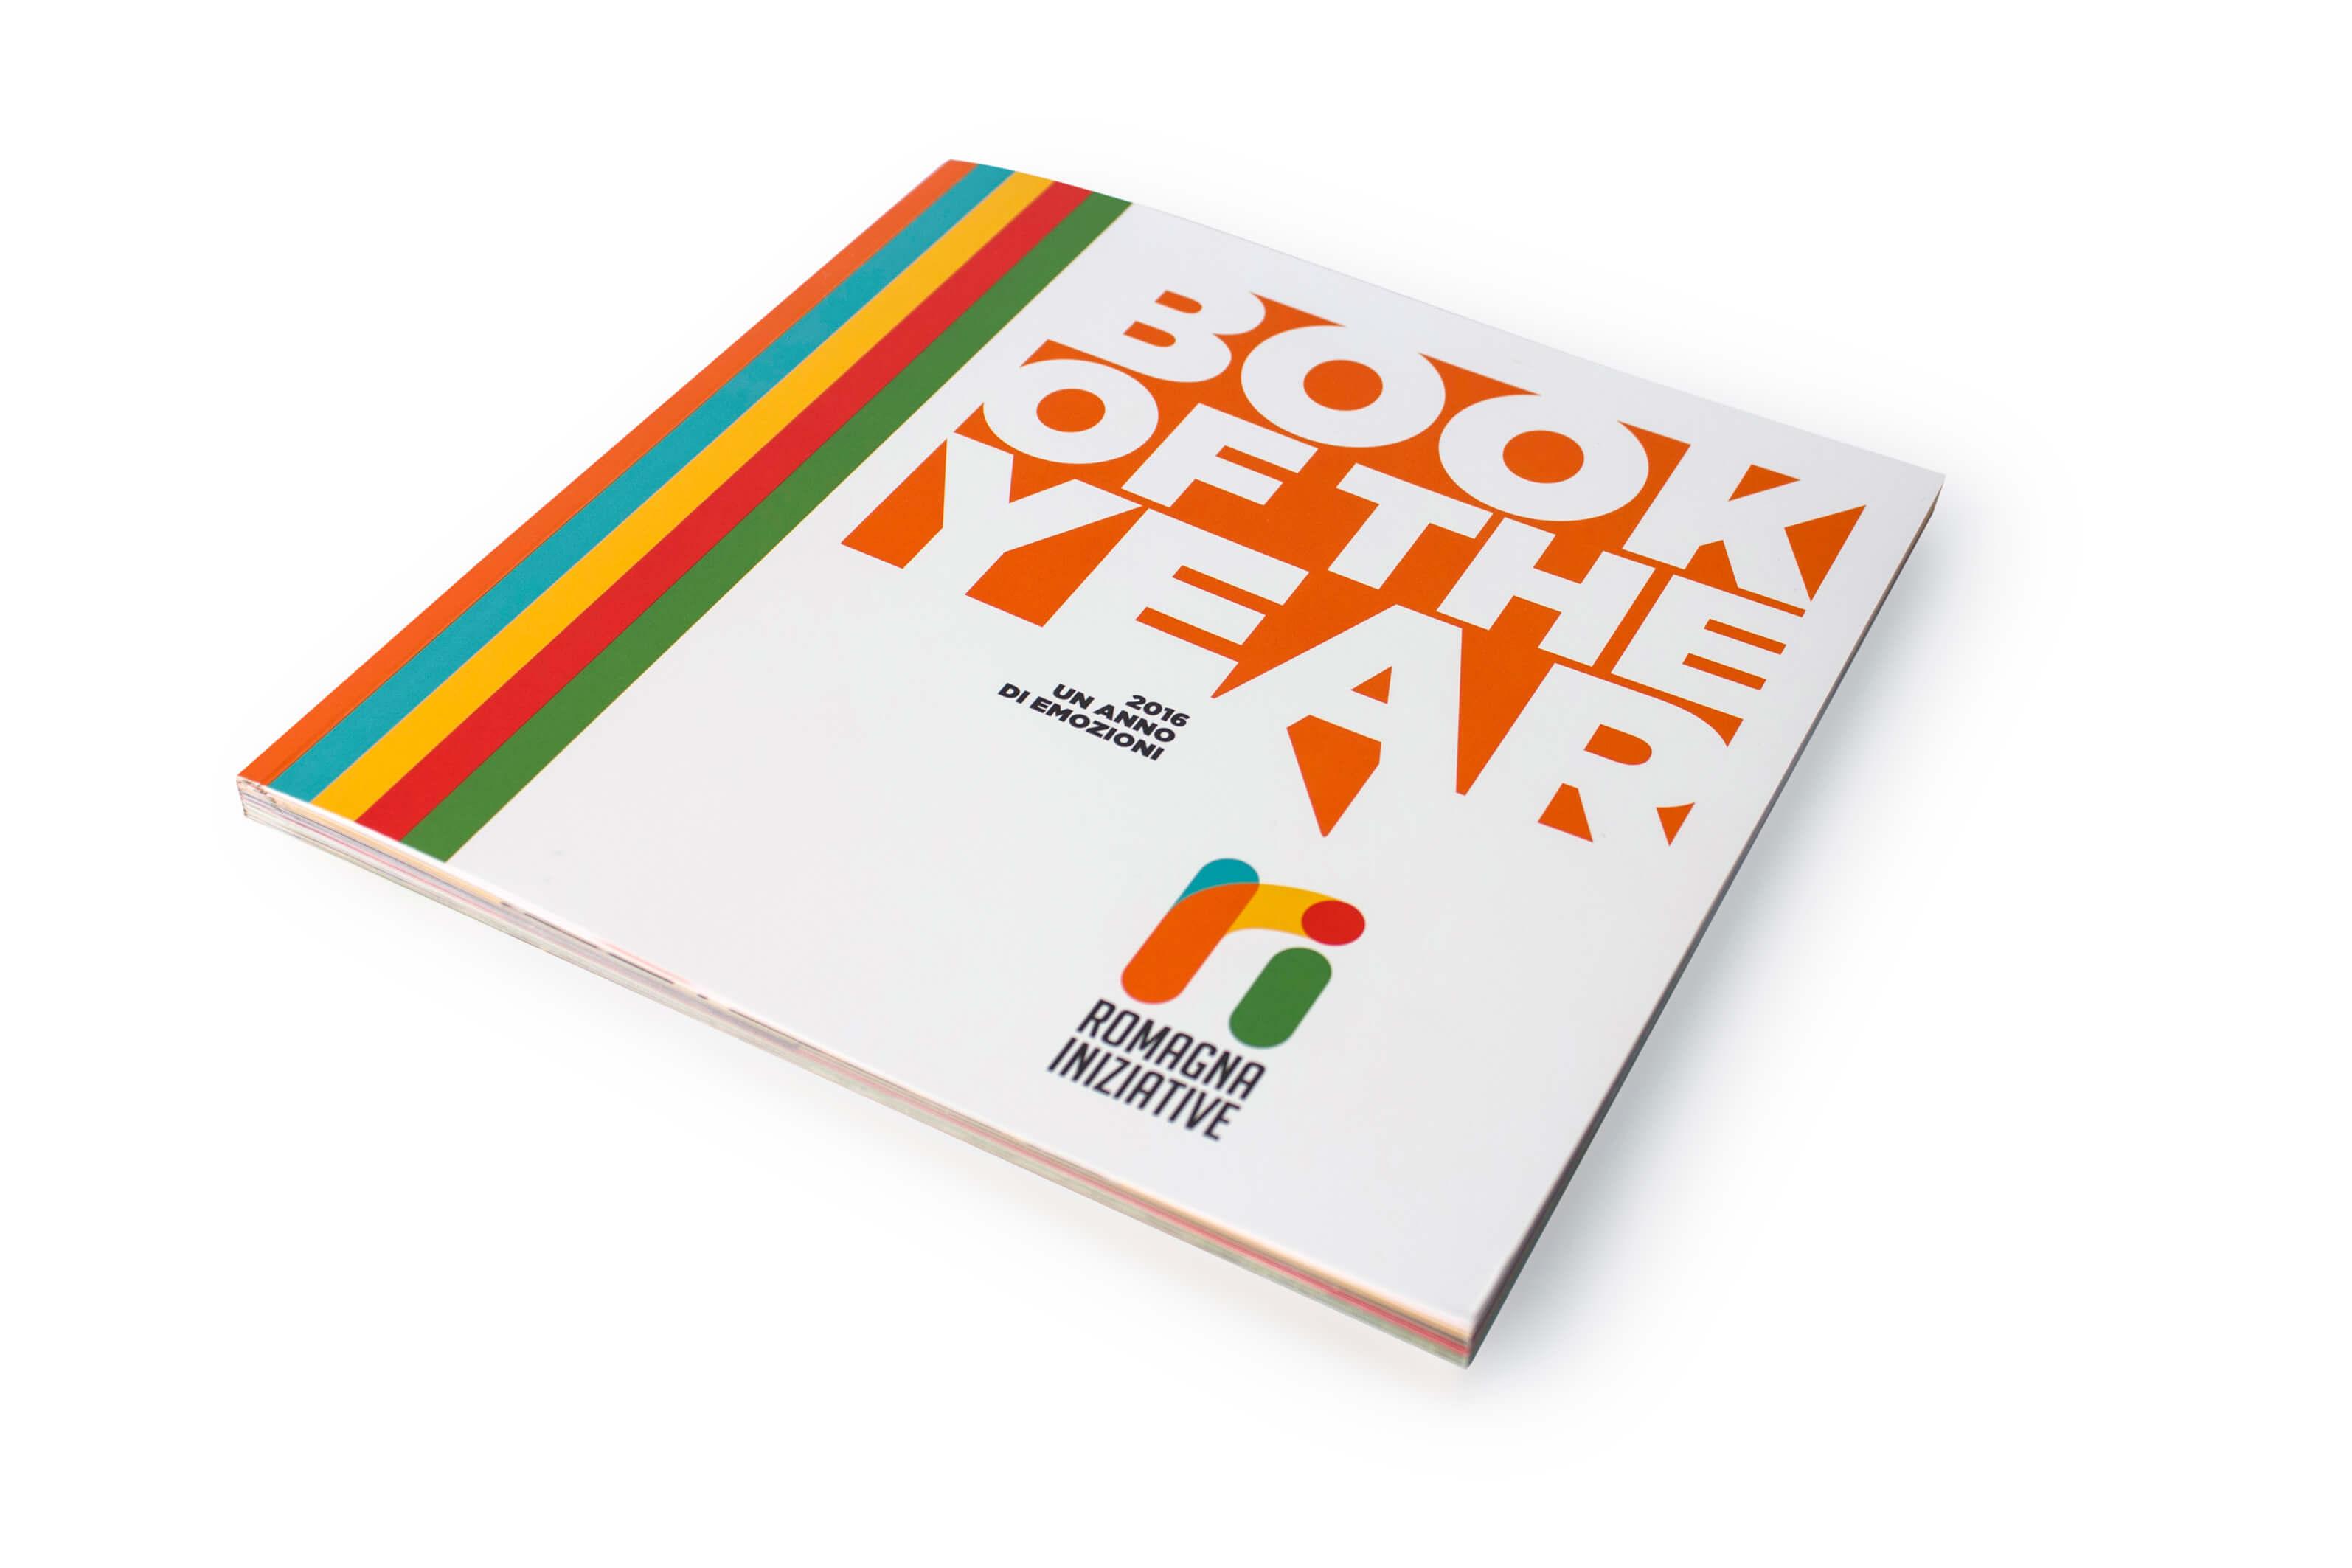 Menabò, agenzia di comunicazione a Forlì, per il Book of the Year 2016 di Romagna Iniziative - Copertina